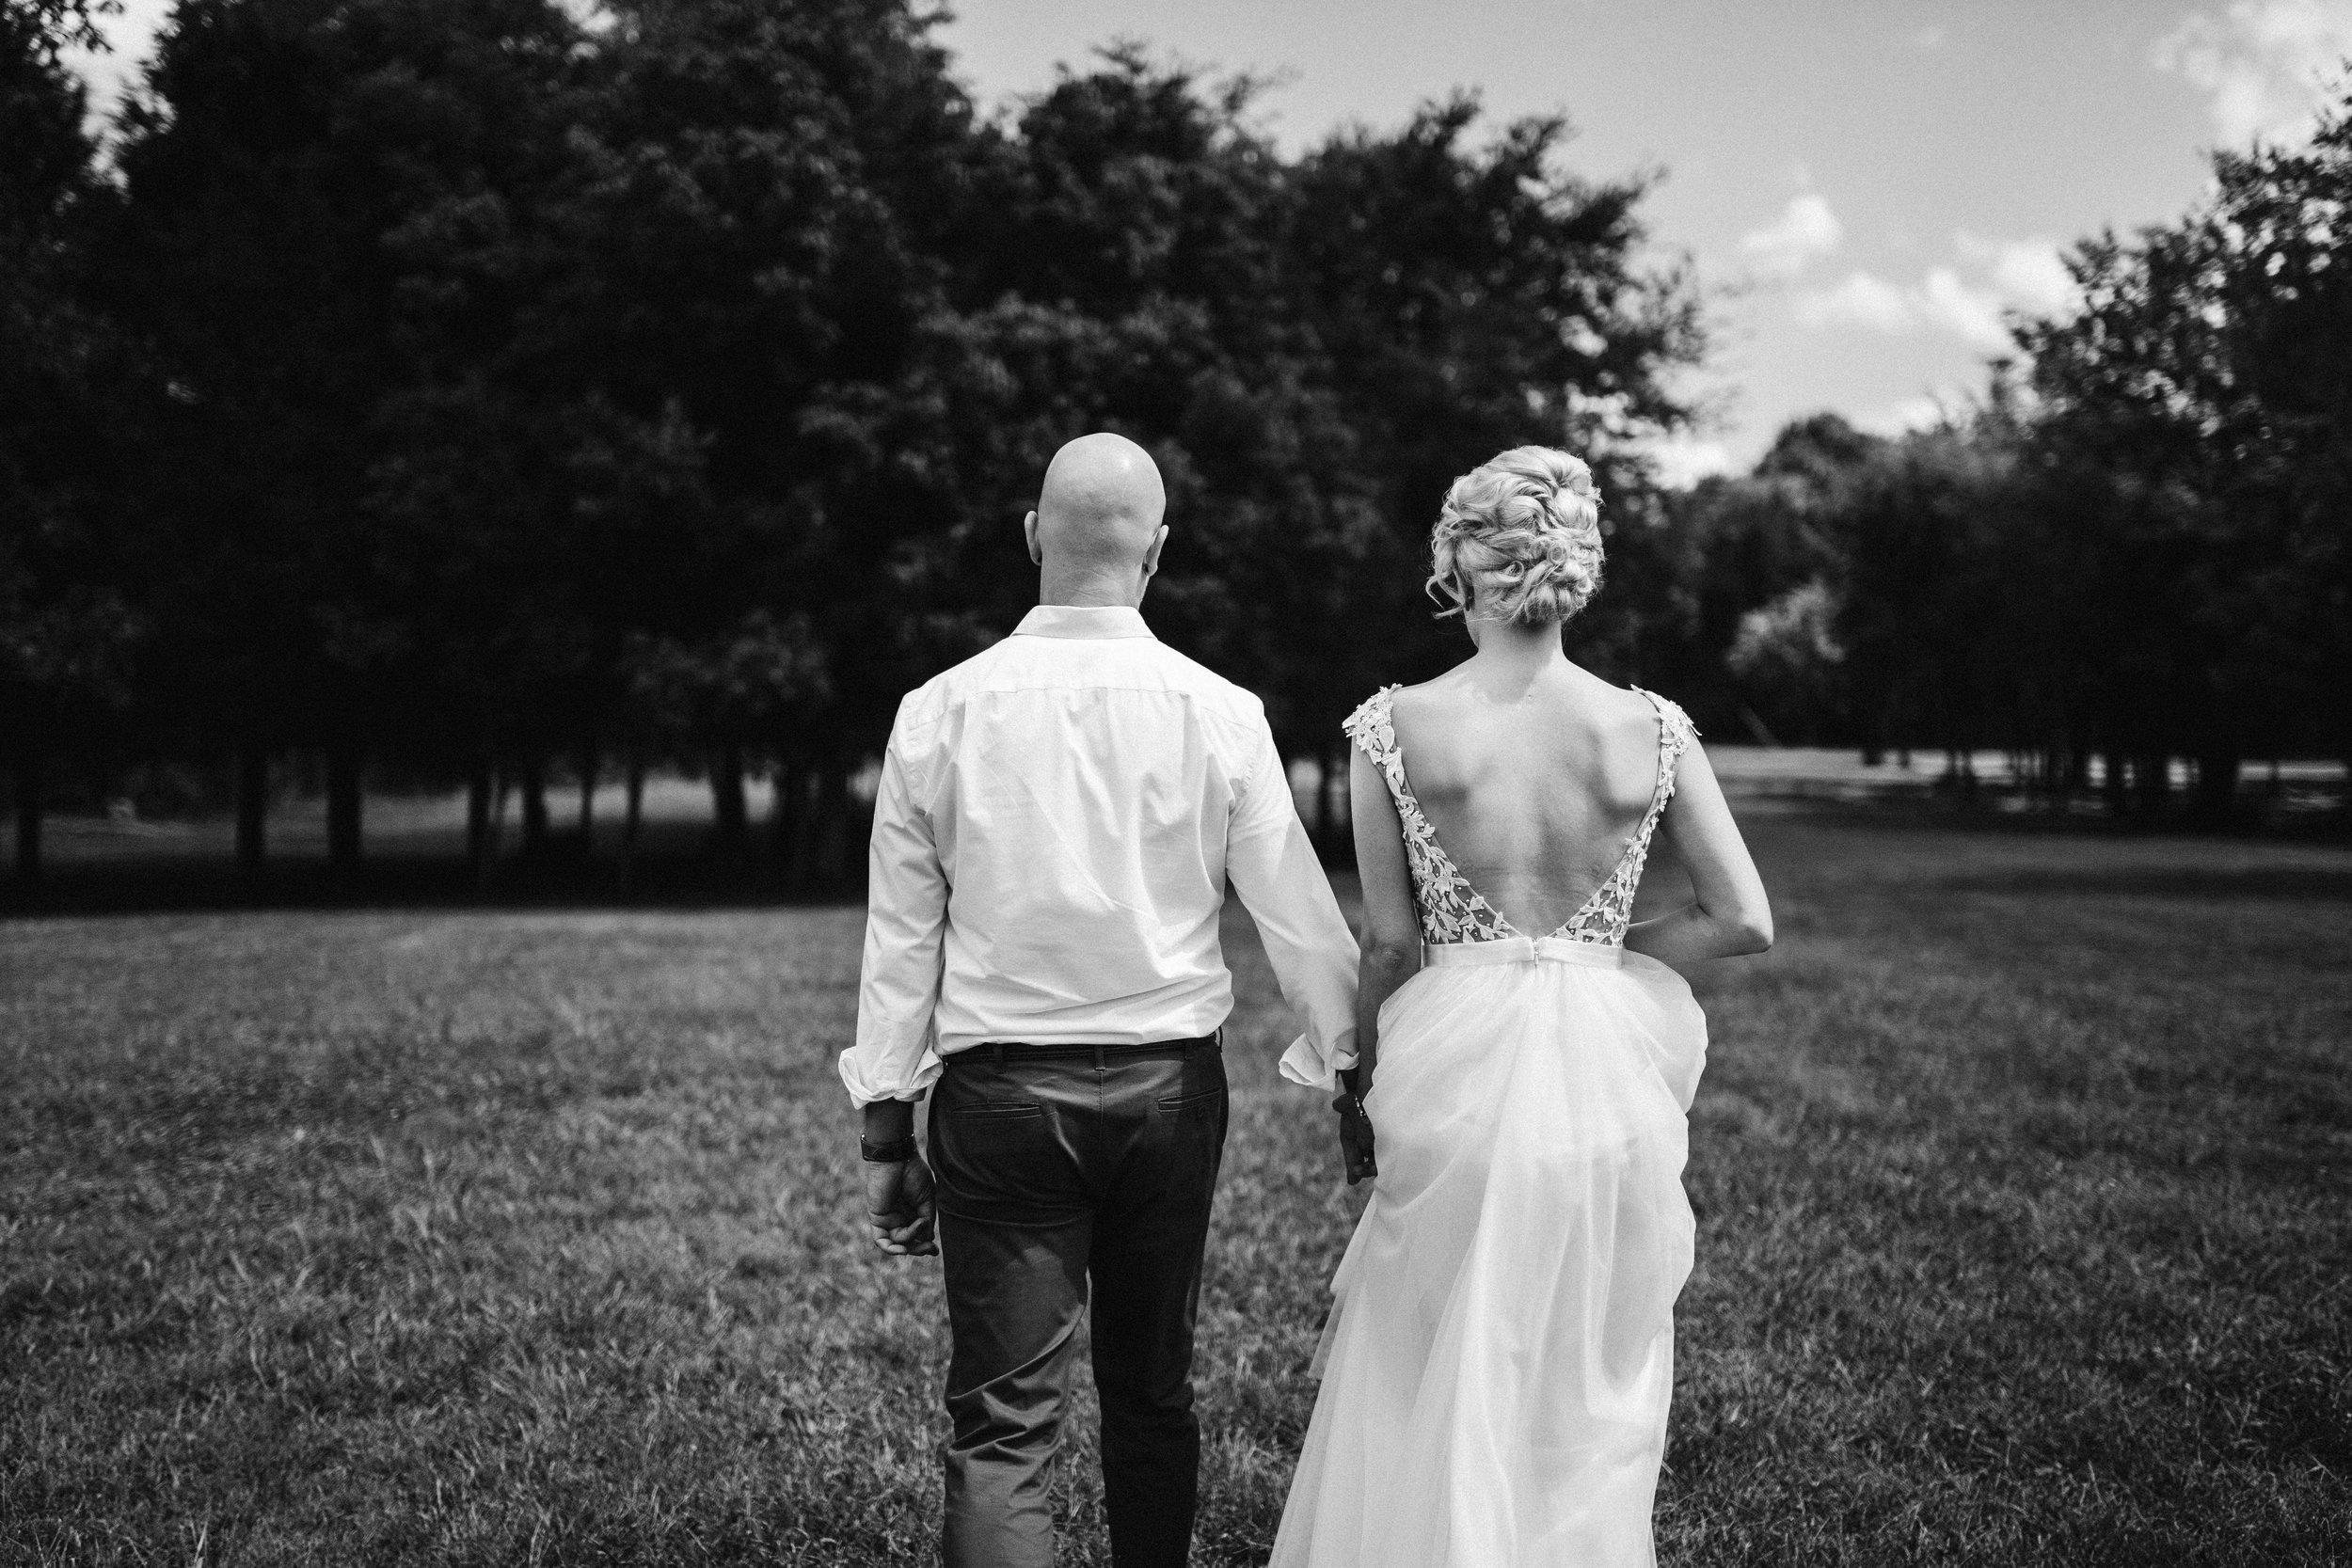 2018.09.02 Ray and Sarah Prizner Nashville TN Wedding FINALS-191.jpg